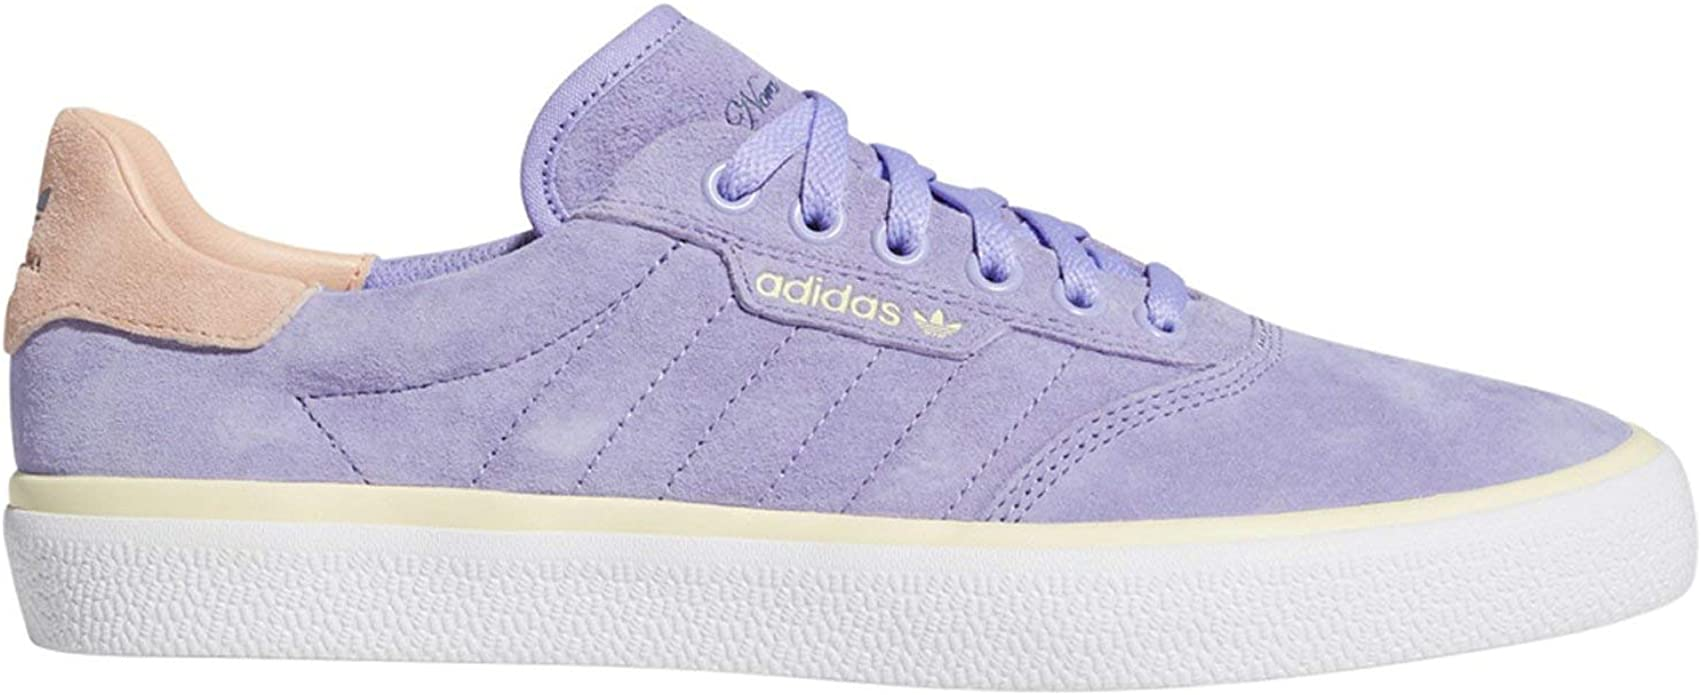 Cheap Adidas Superstar Glitter Purple Green White Womens